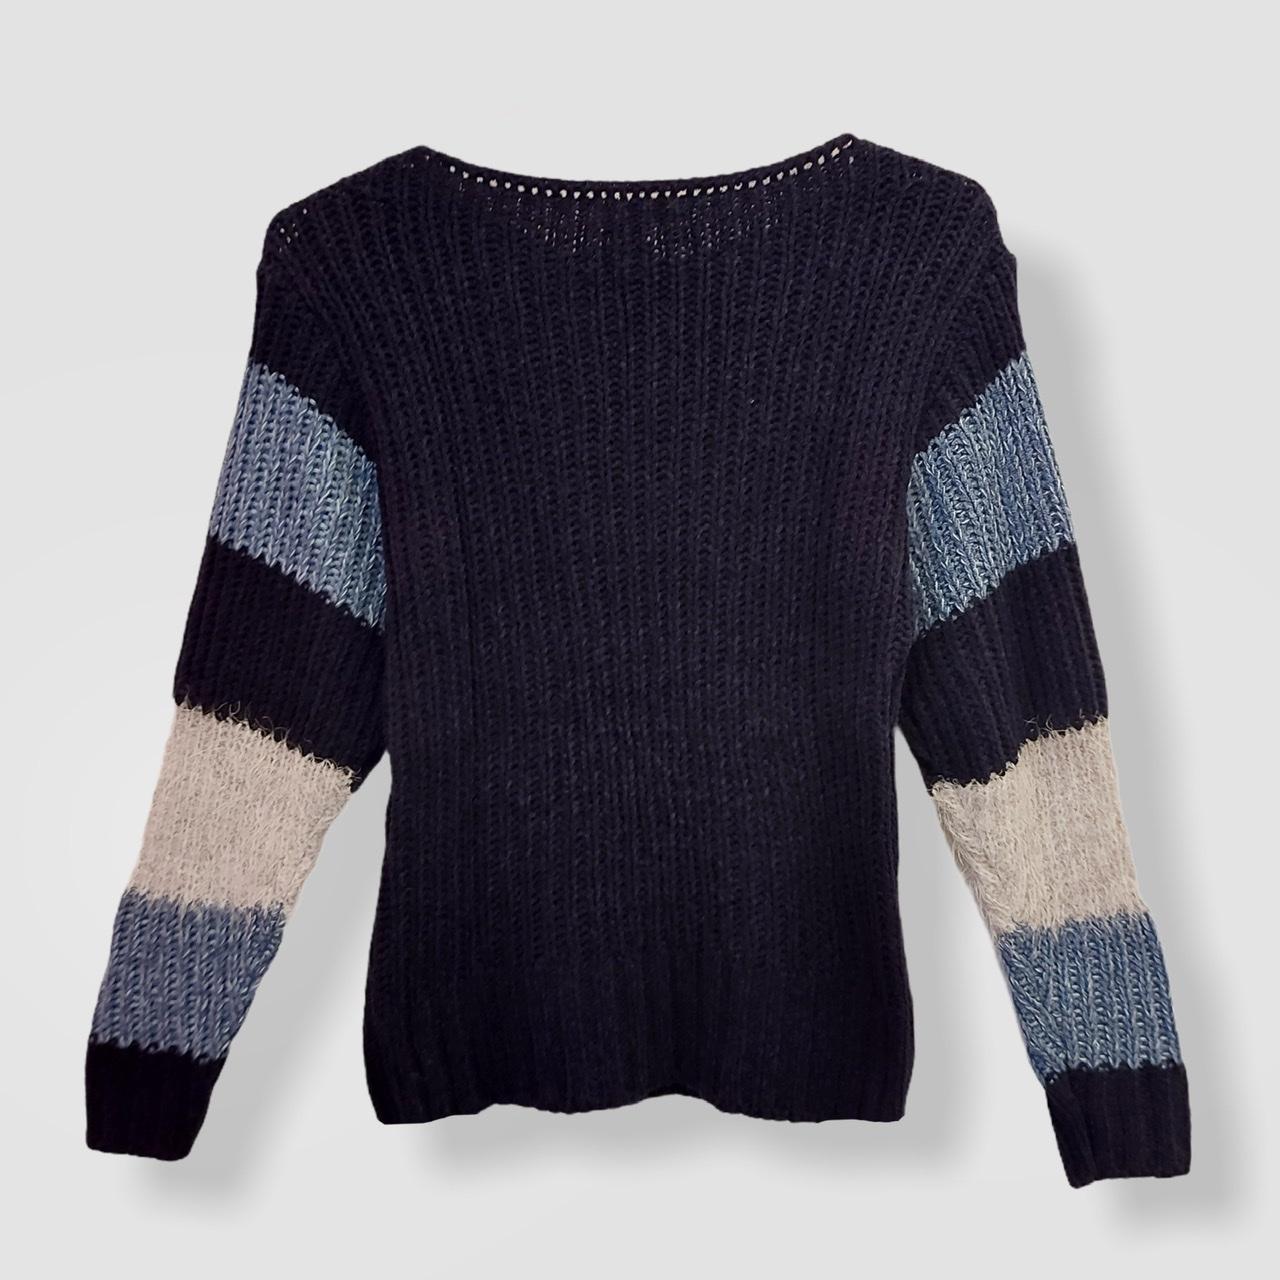 Blusa Morgot listrada tricot  - Vivian Bógus